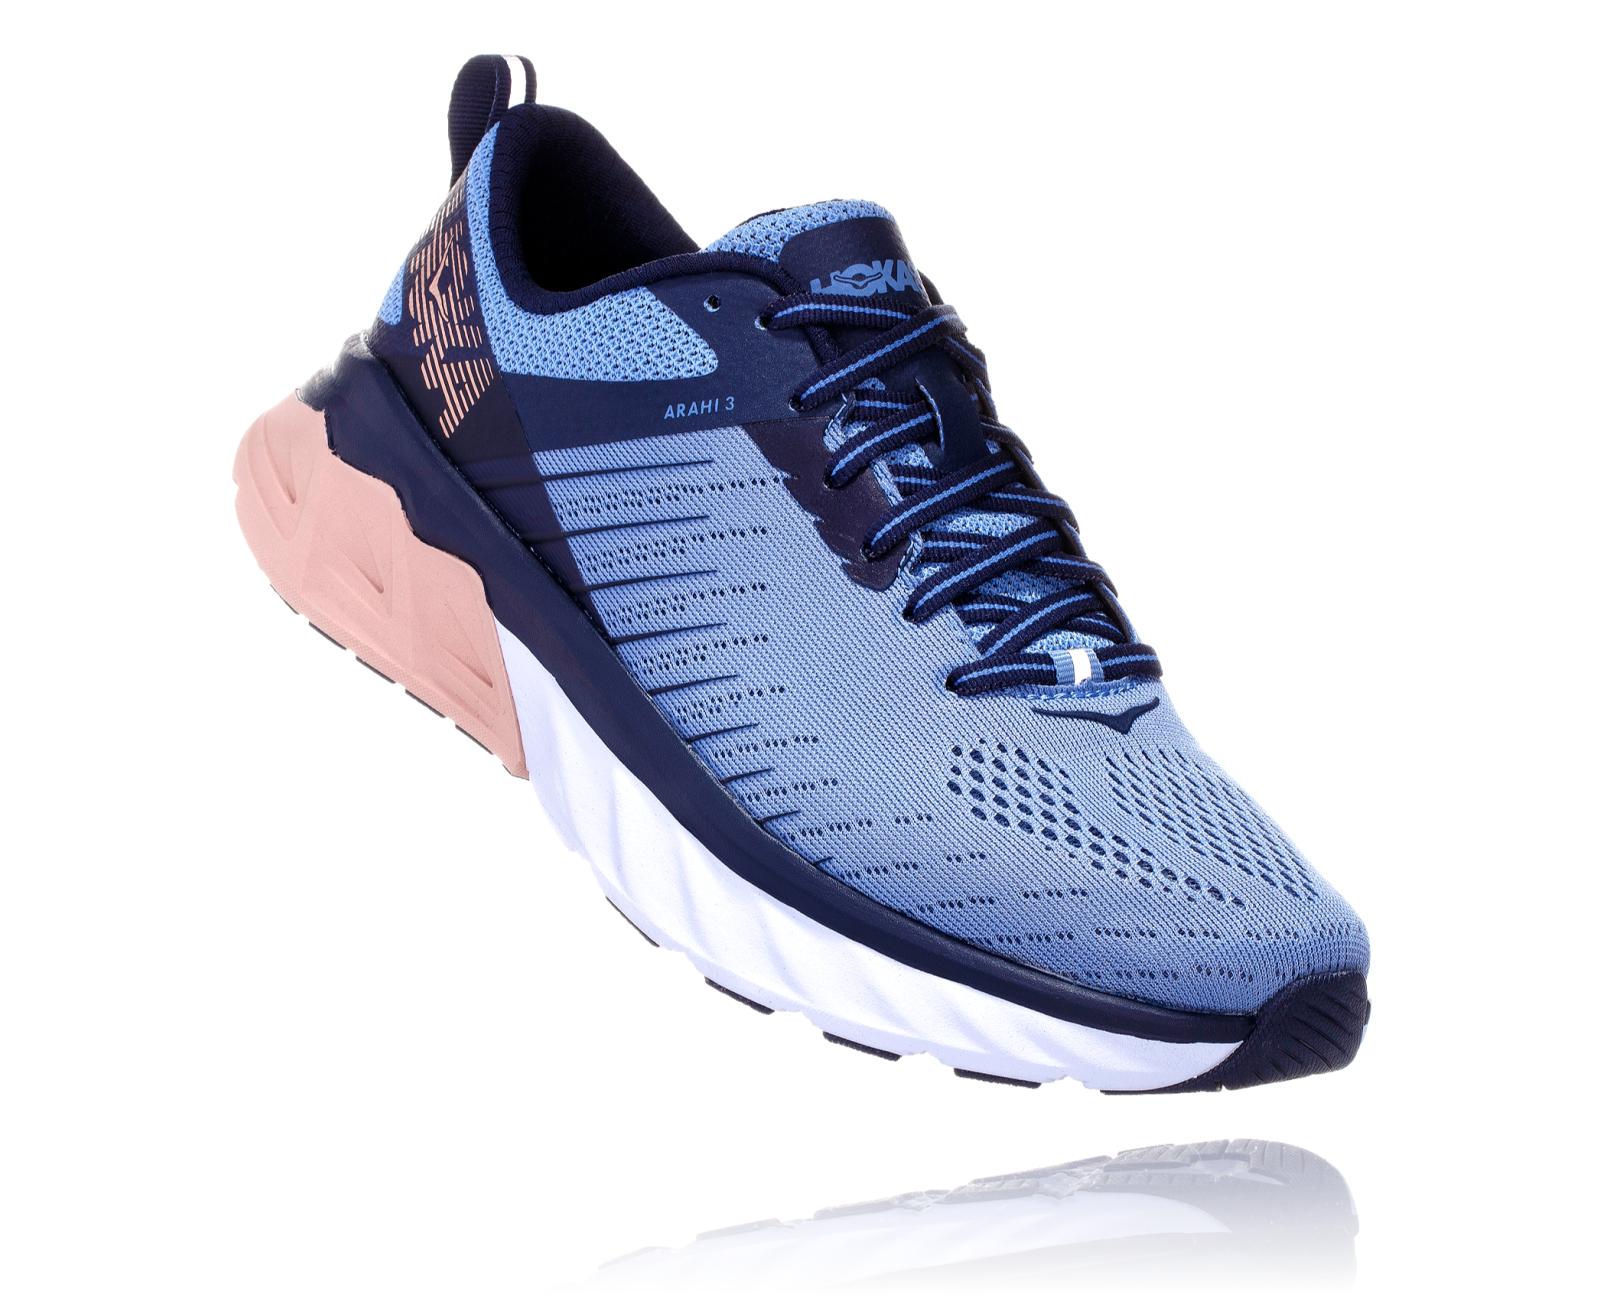 Women's Arahi 3 - Hoka One One Athletic Shoes-Hoka One One